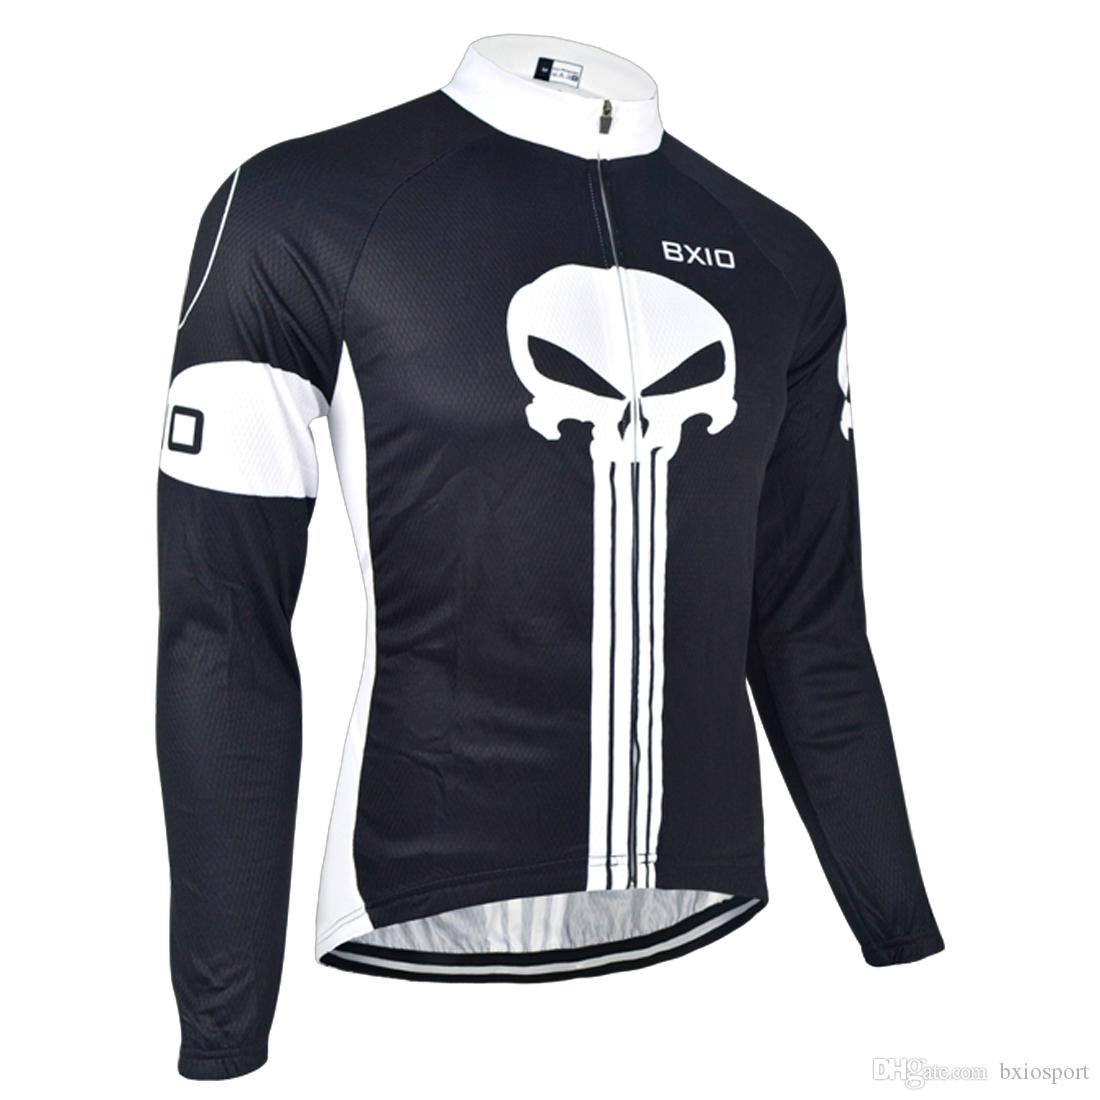 133ae472e BXIO Brand Cycling Clothing Long Sleeve Winter Cycling Jersey Autumn  Cycling Shirt Skull Black Anti UV Bicycle Clothing BX 024 Bike Shirts Biking  Clothes ...